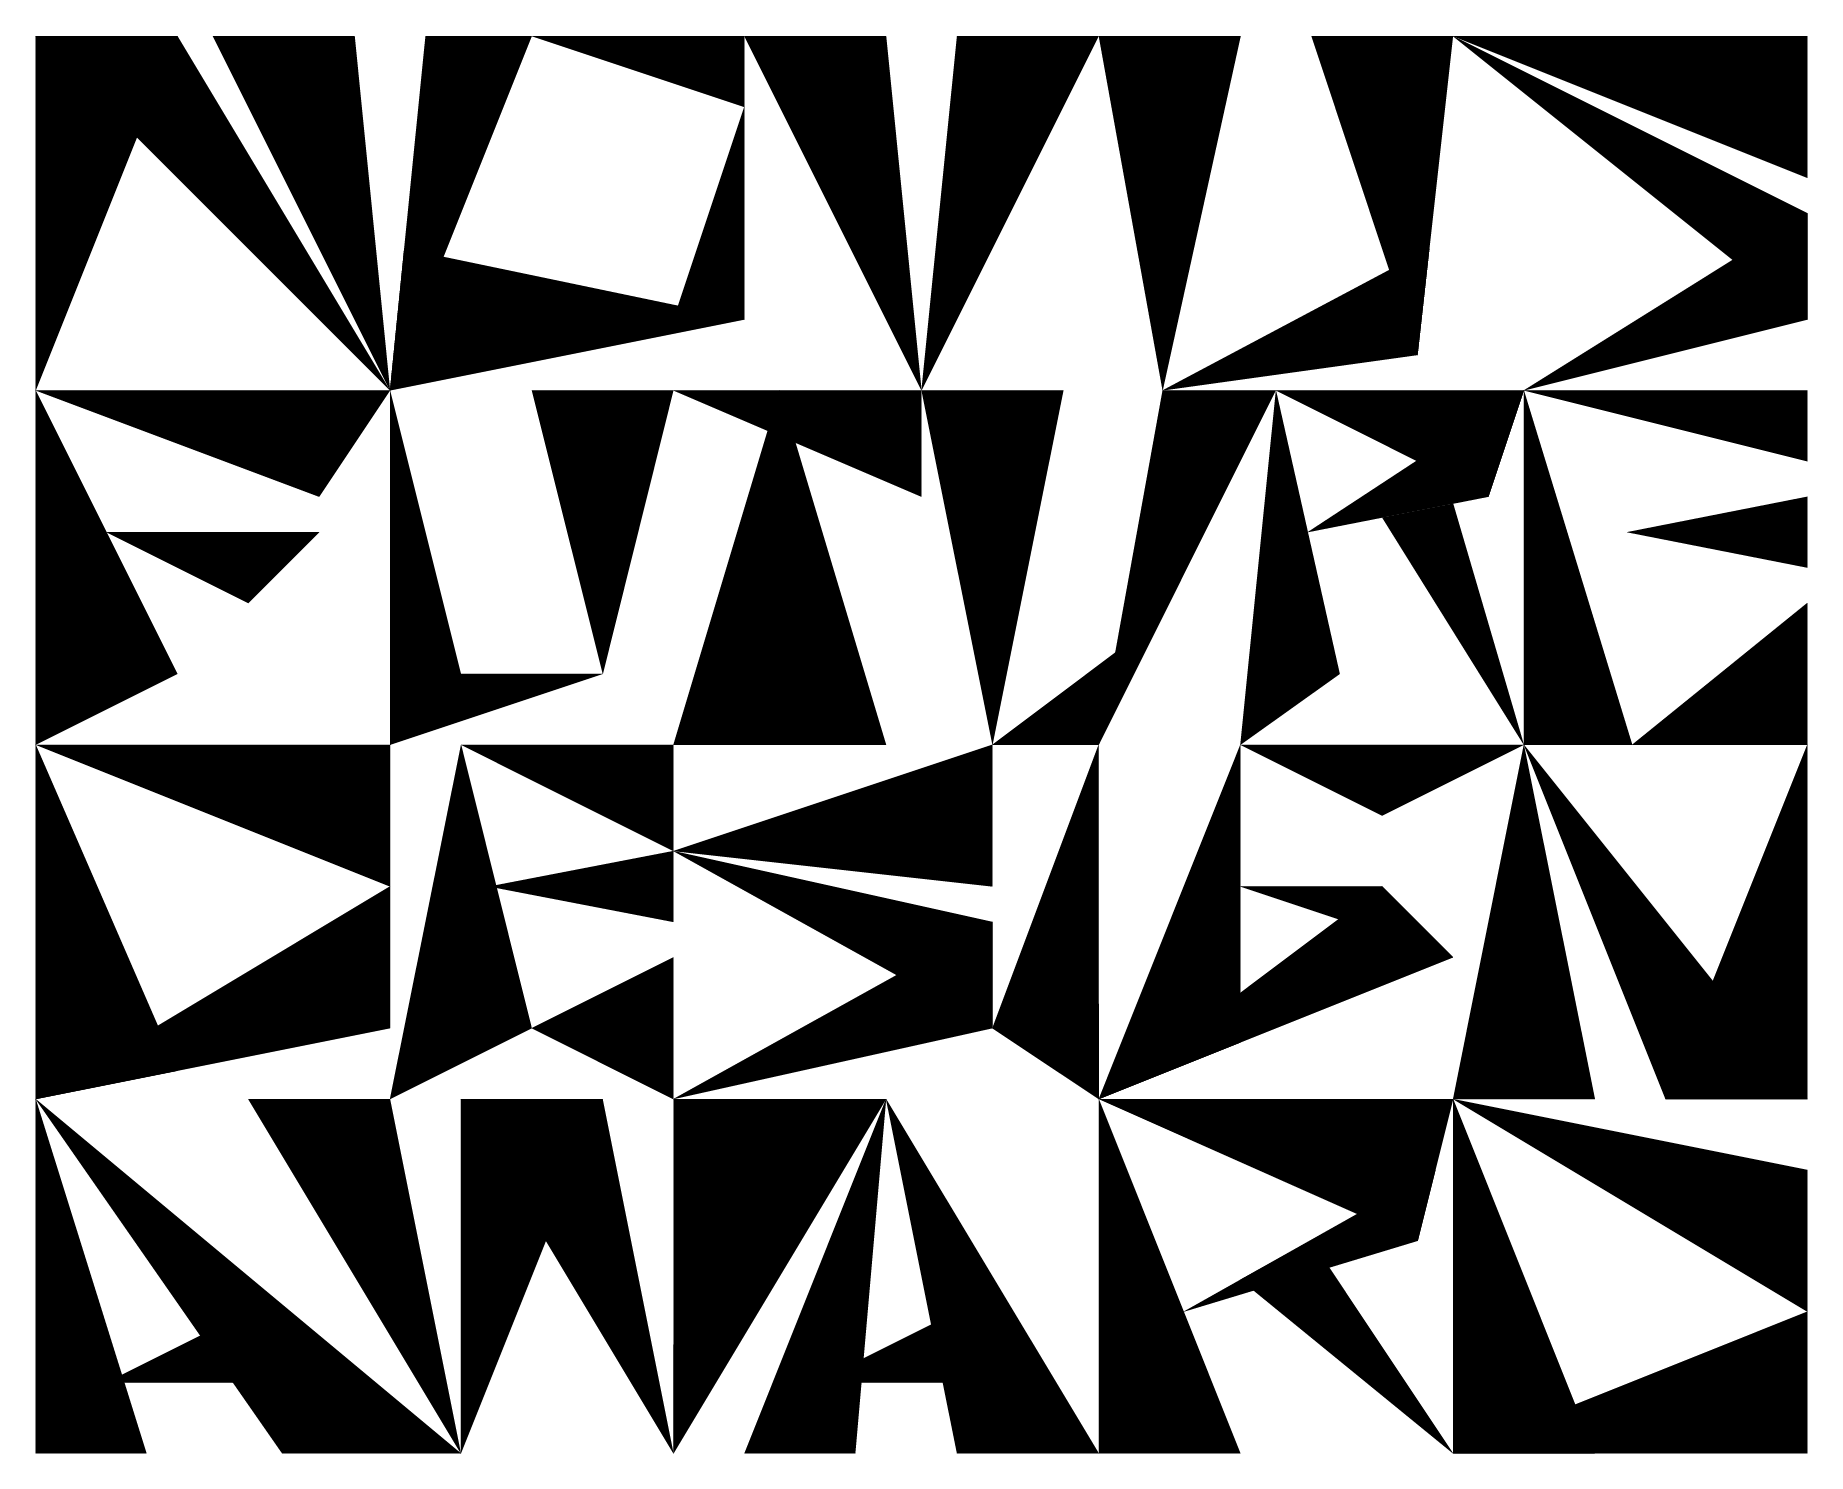 NFDA_logo1.0_201019_OL-02 NOVUS FUTURE DESIGN AWARD 6つの受賞作が決定